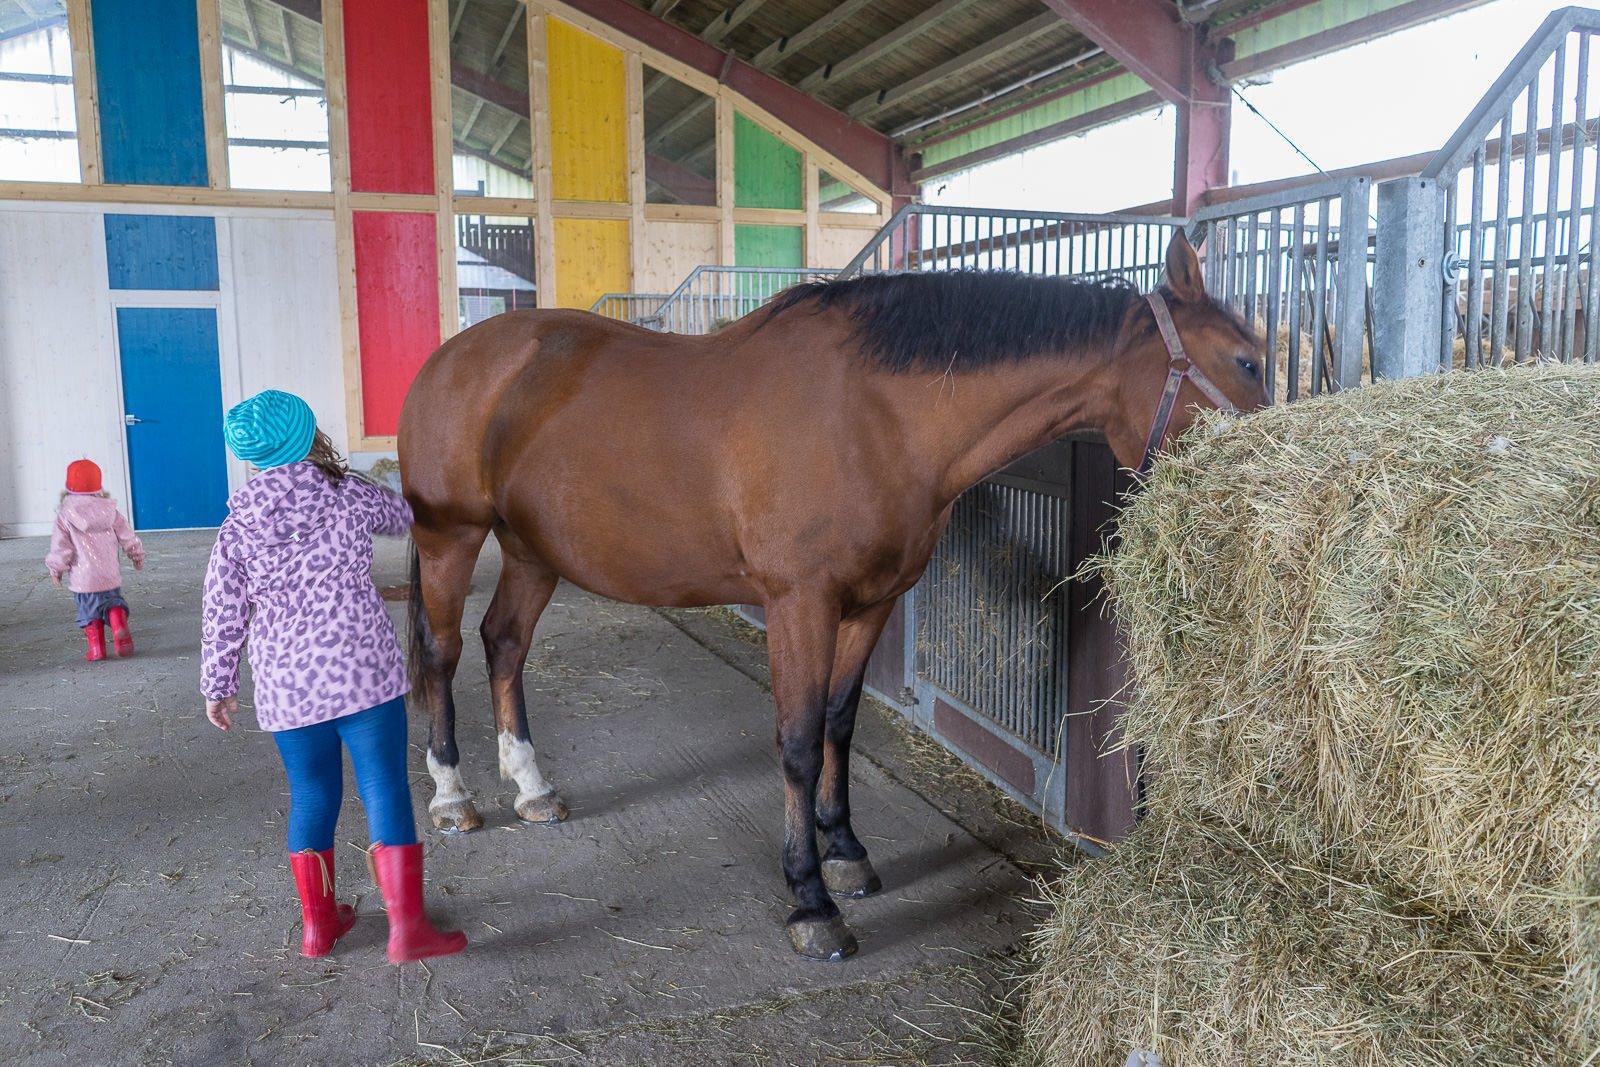 Pferde urlaub Hof köhne Landreise